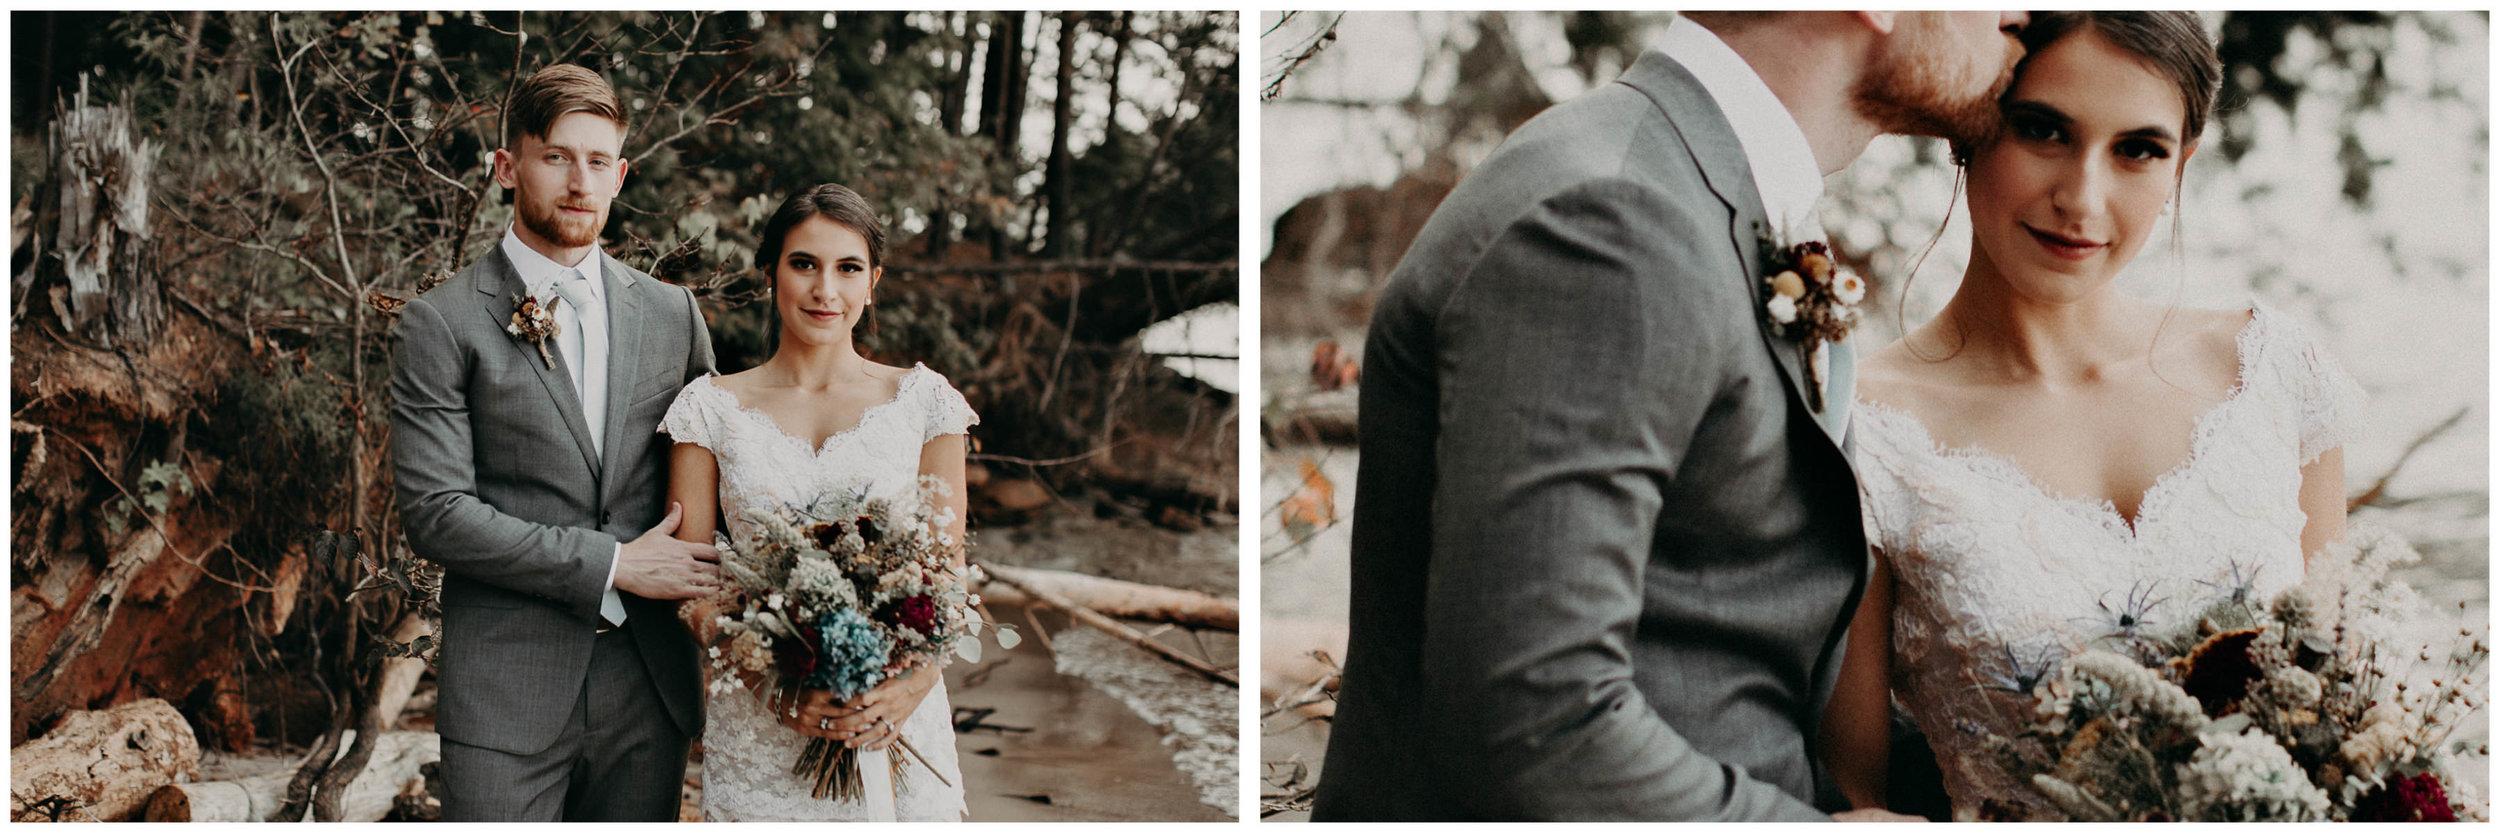 59  Bride & Groom Portraits before the ceremony on wedding day - Atlanta Wedding Photographer .jpg